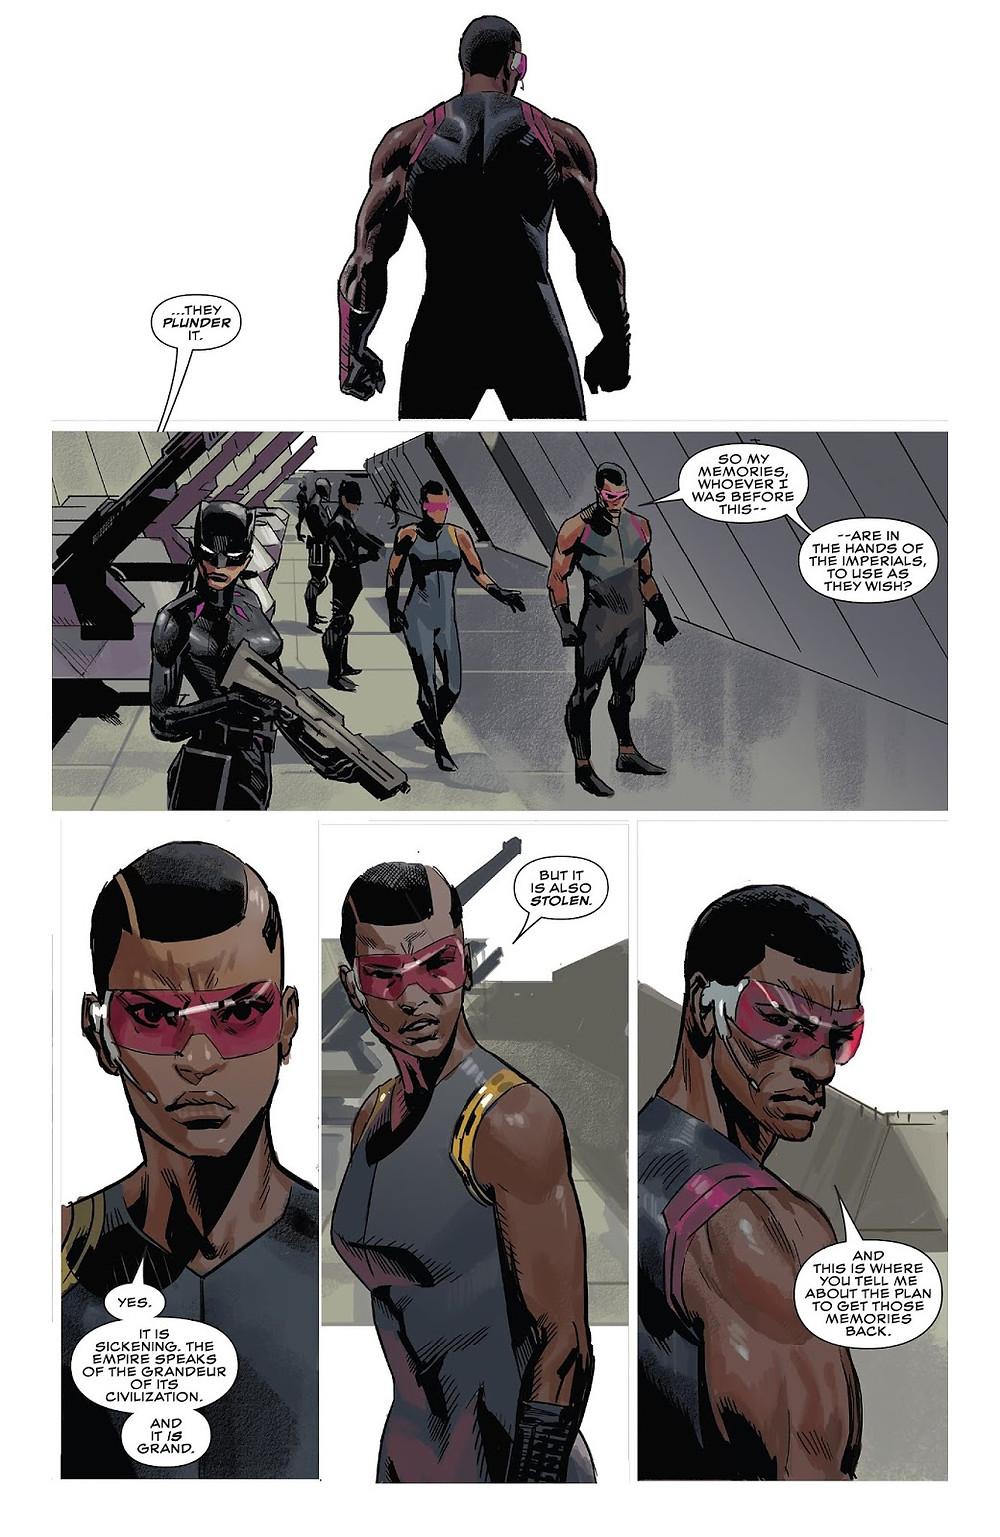 Black Panther #3 Ta-Nehisi Coates & Daniel Acuna